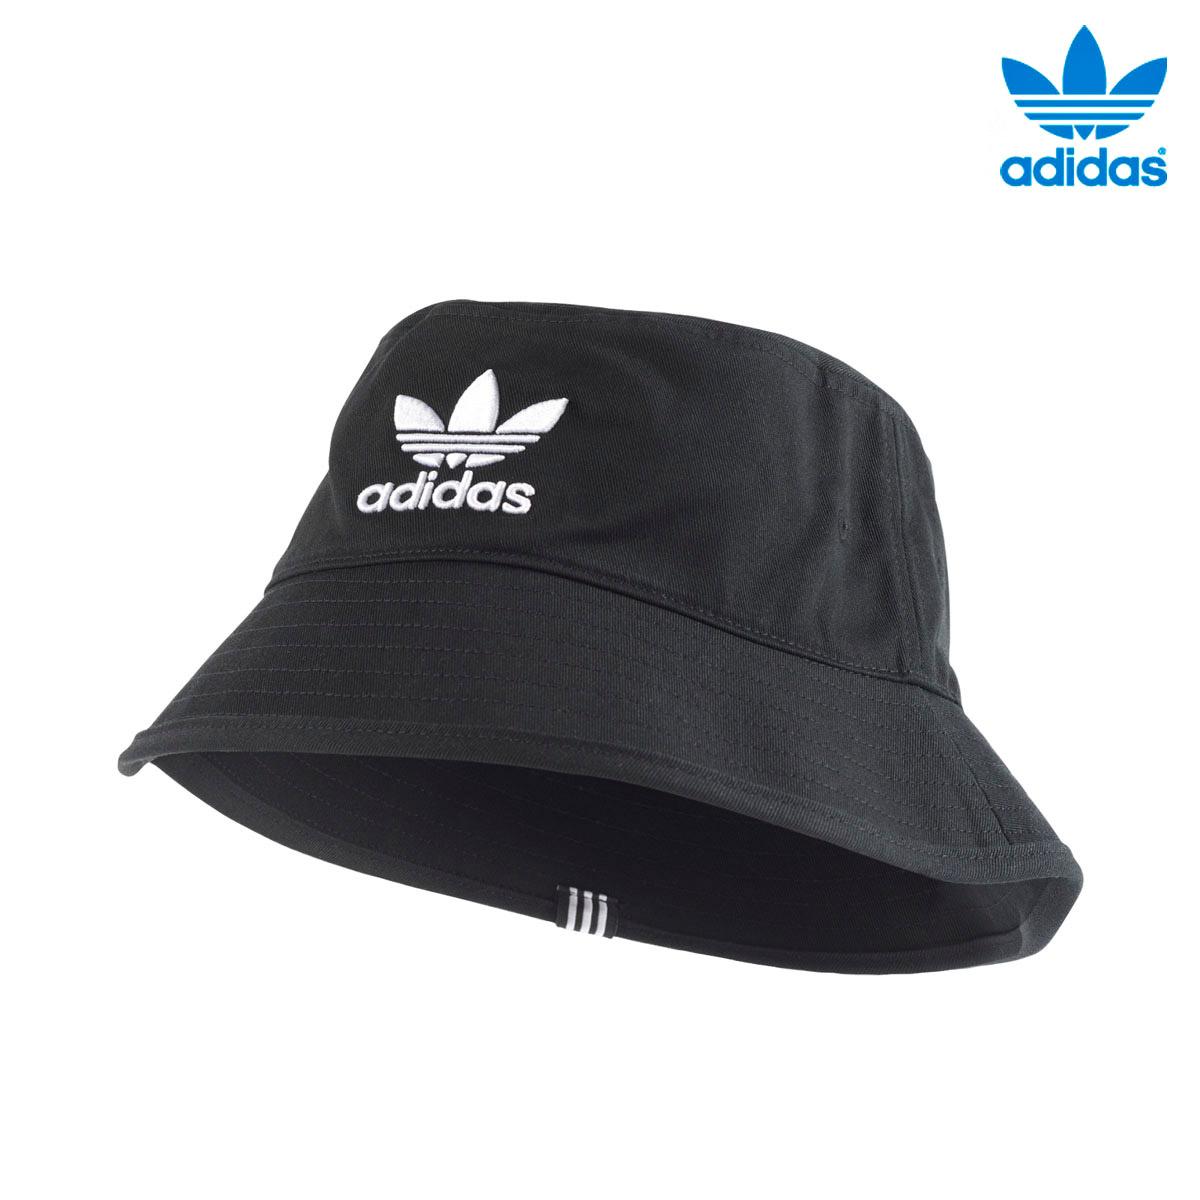 a41956dce6b atmos pink  adidas Originals BUCKET HAT AC (Adidas pail hat AC ...